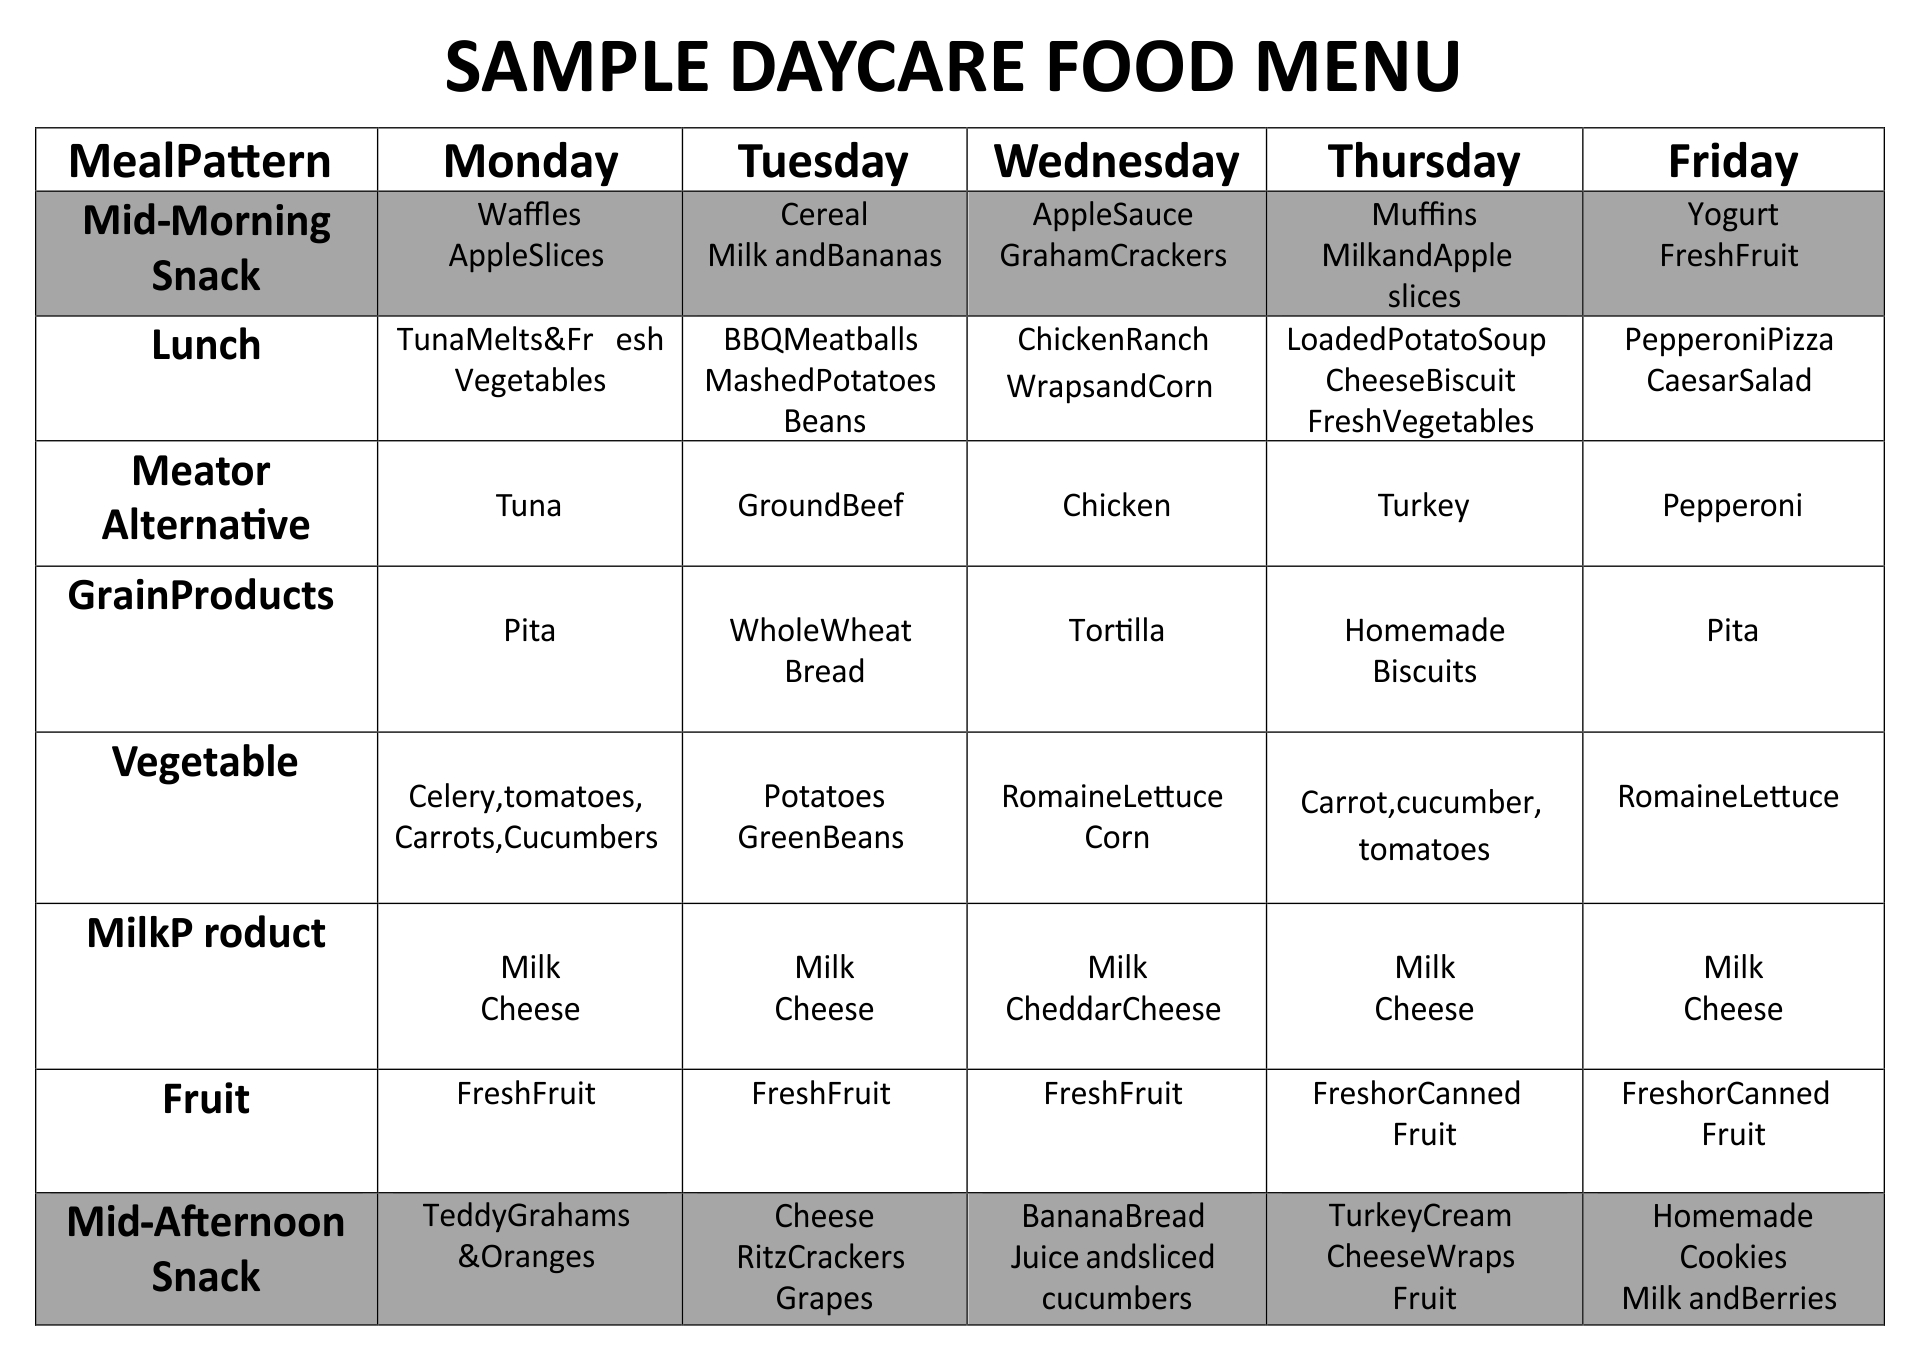 Sample Daycare Food Menu